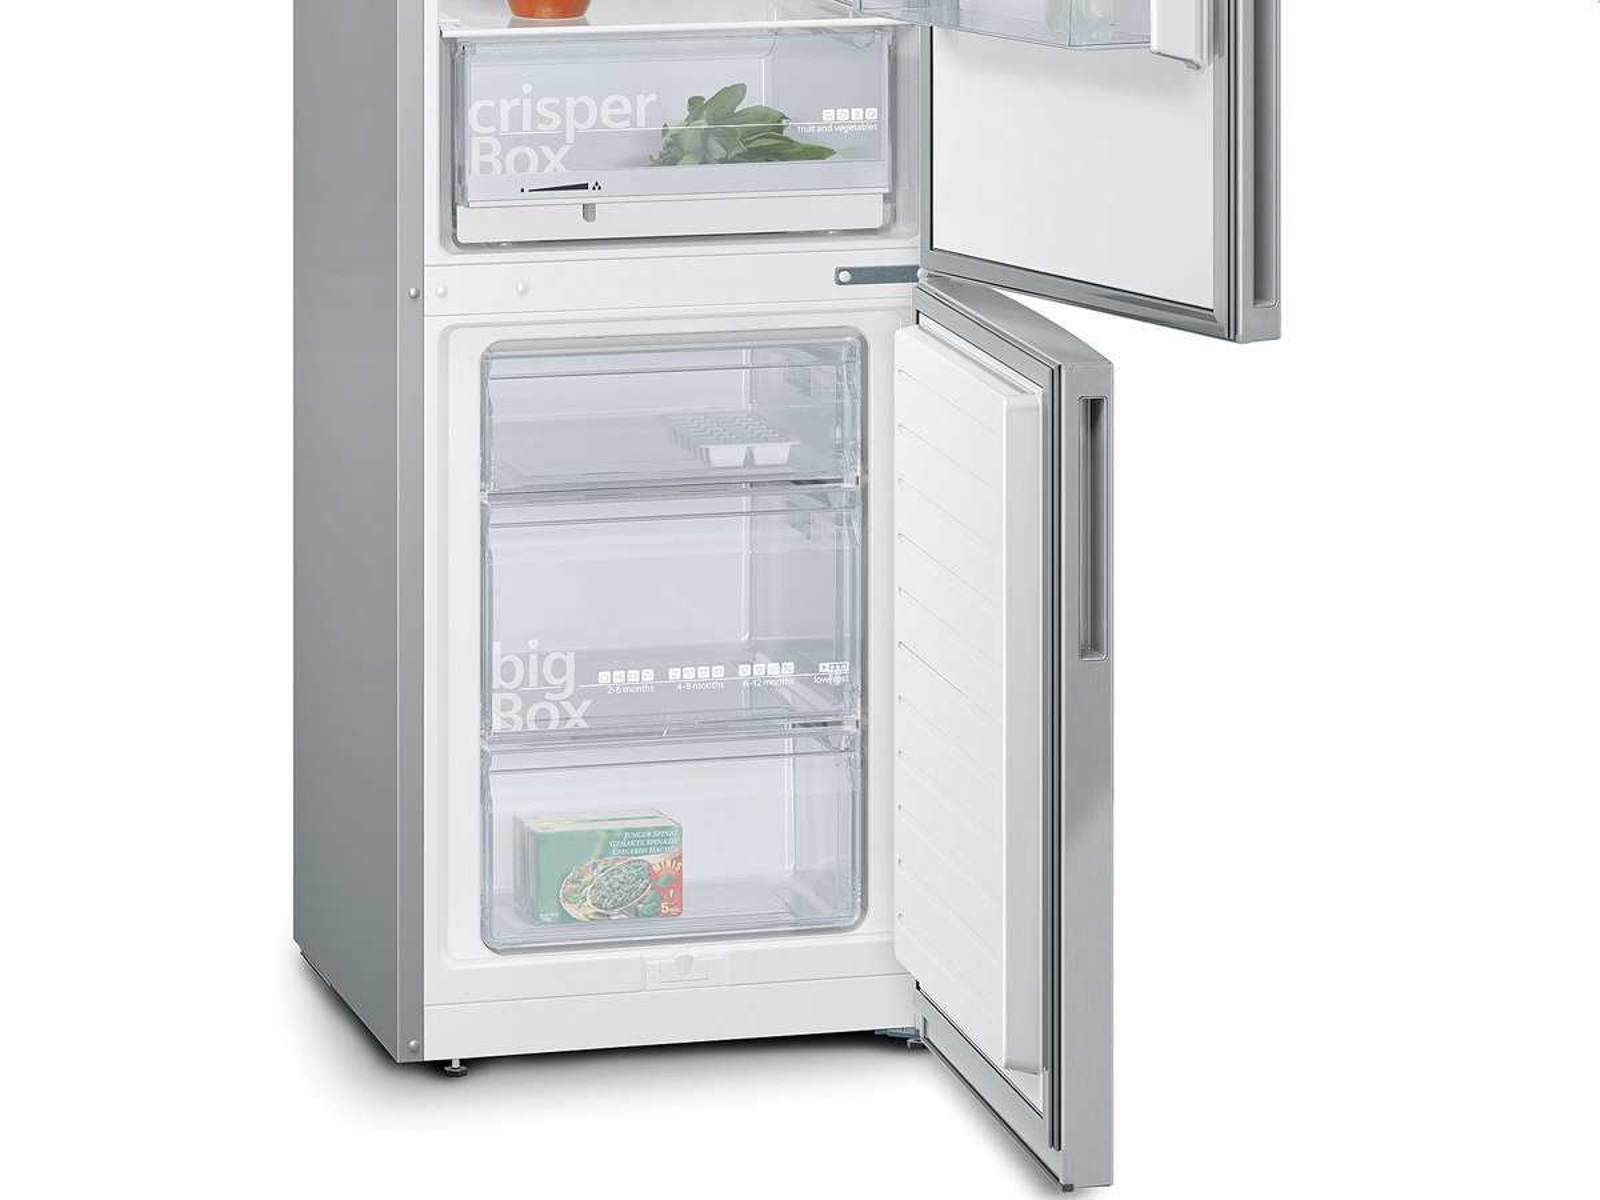 Bosch Kühlschrank No Frost Kühlt Nicht : Liebherr kühlschrank premium biofresh no frost kühlt nicht